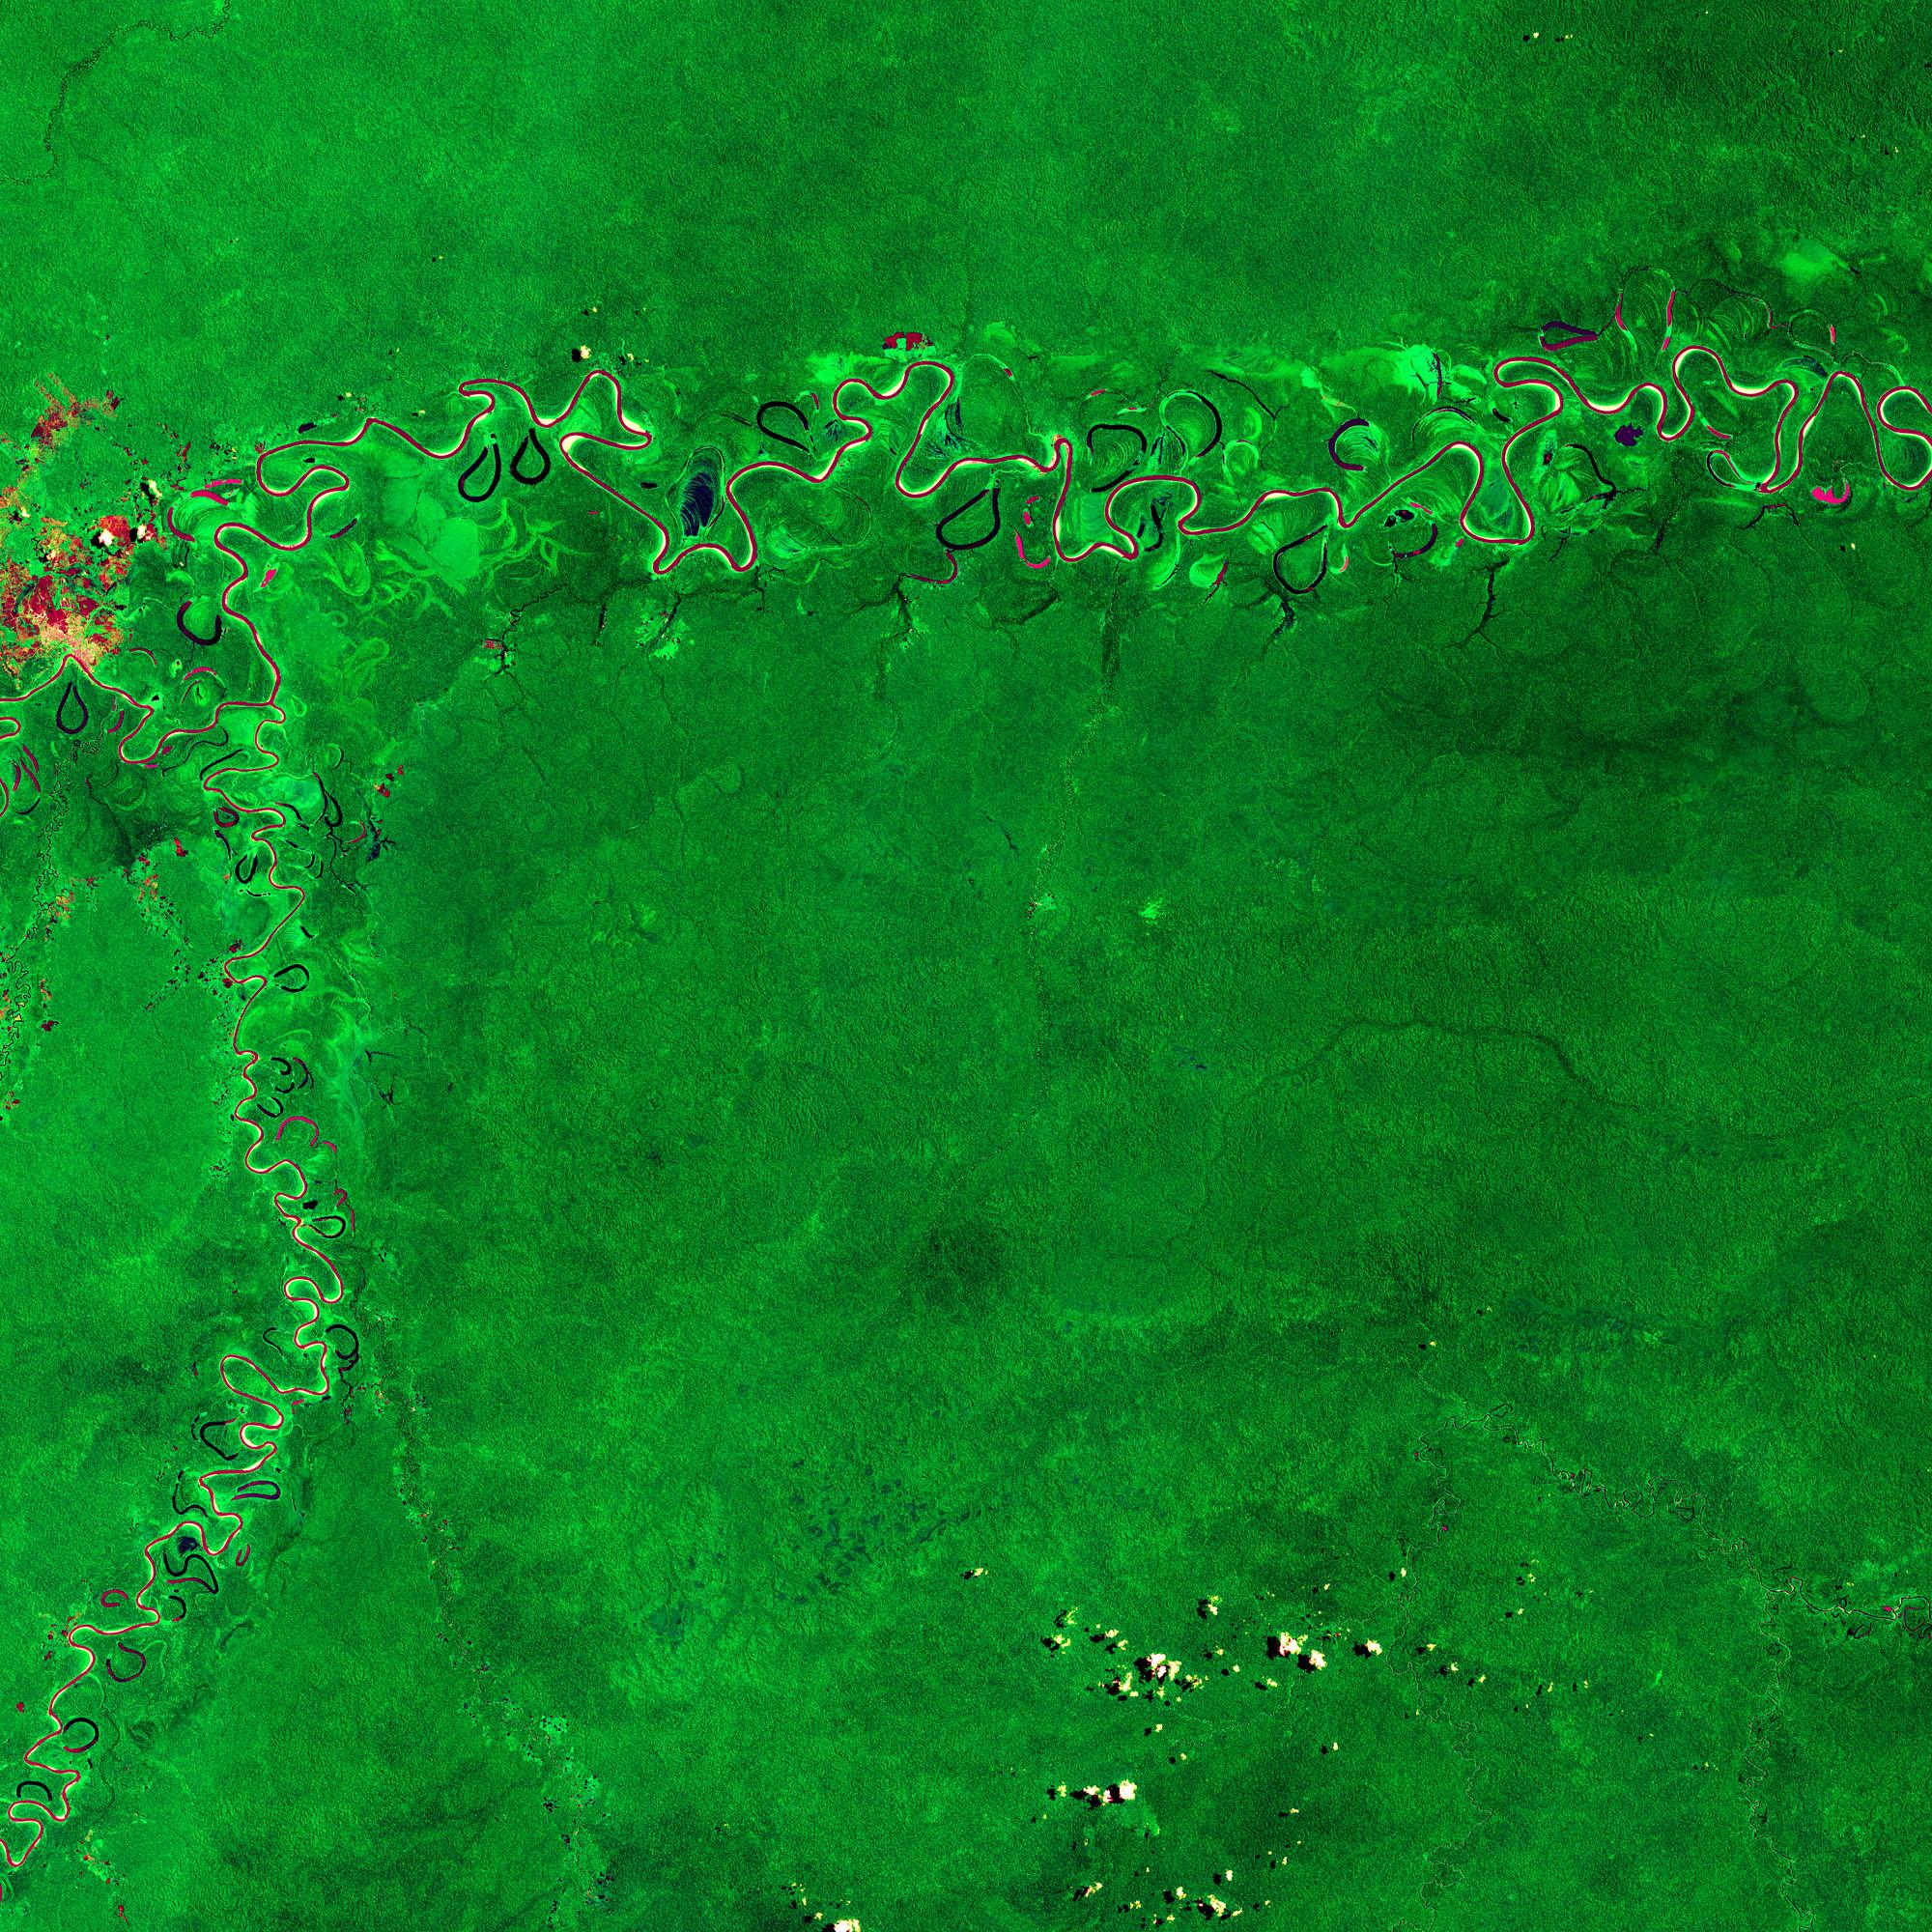 satellite data image of amazon rainforest